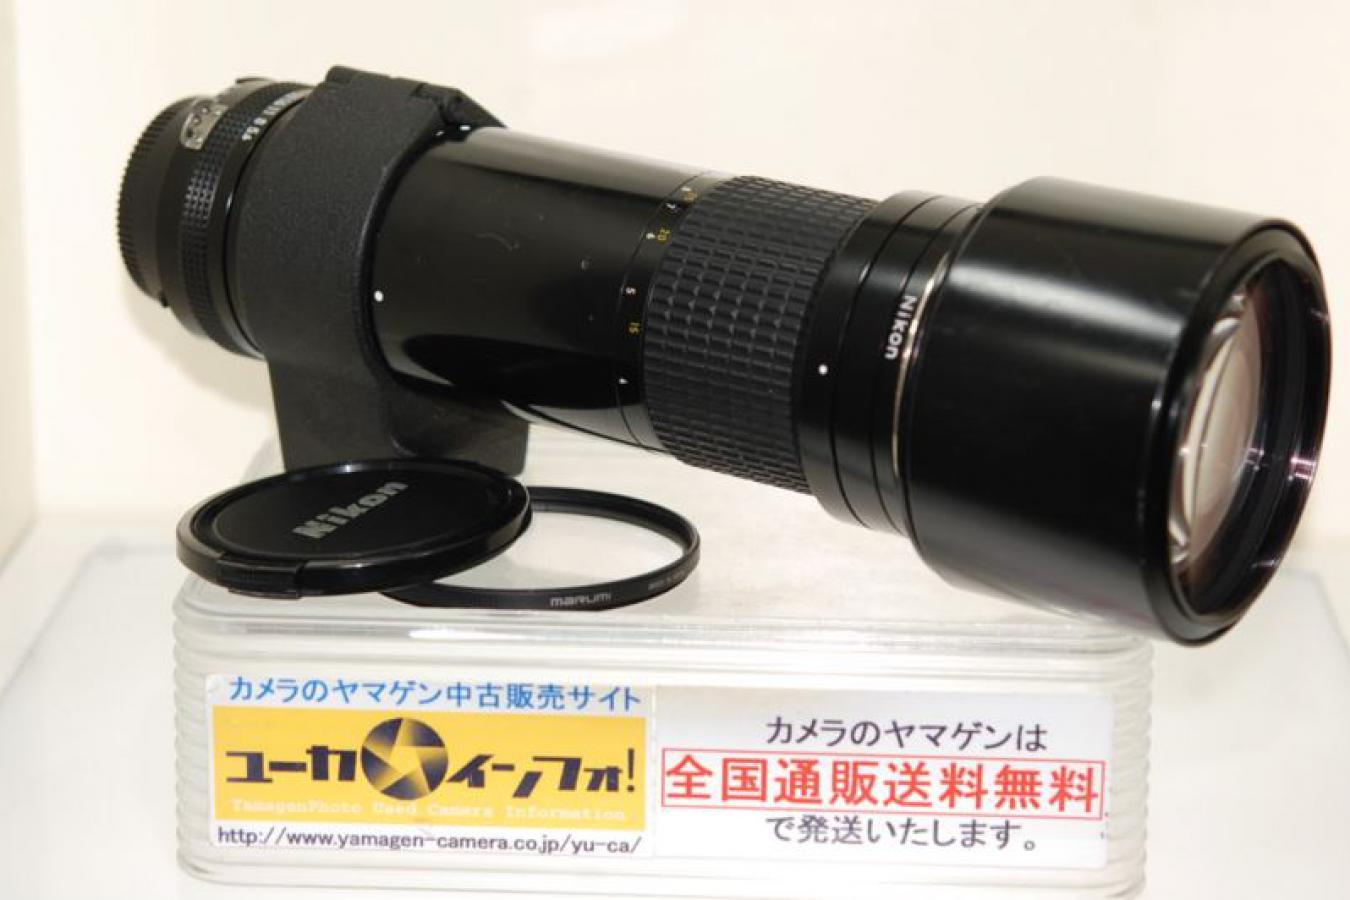 Ai-S NIKKOR*ED 400mm F5.6 【マルミ製72mmDHGレンズプロテクトフィルター付】